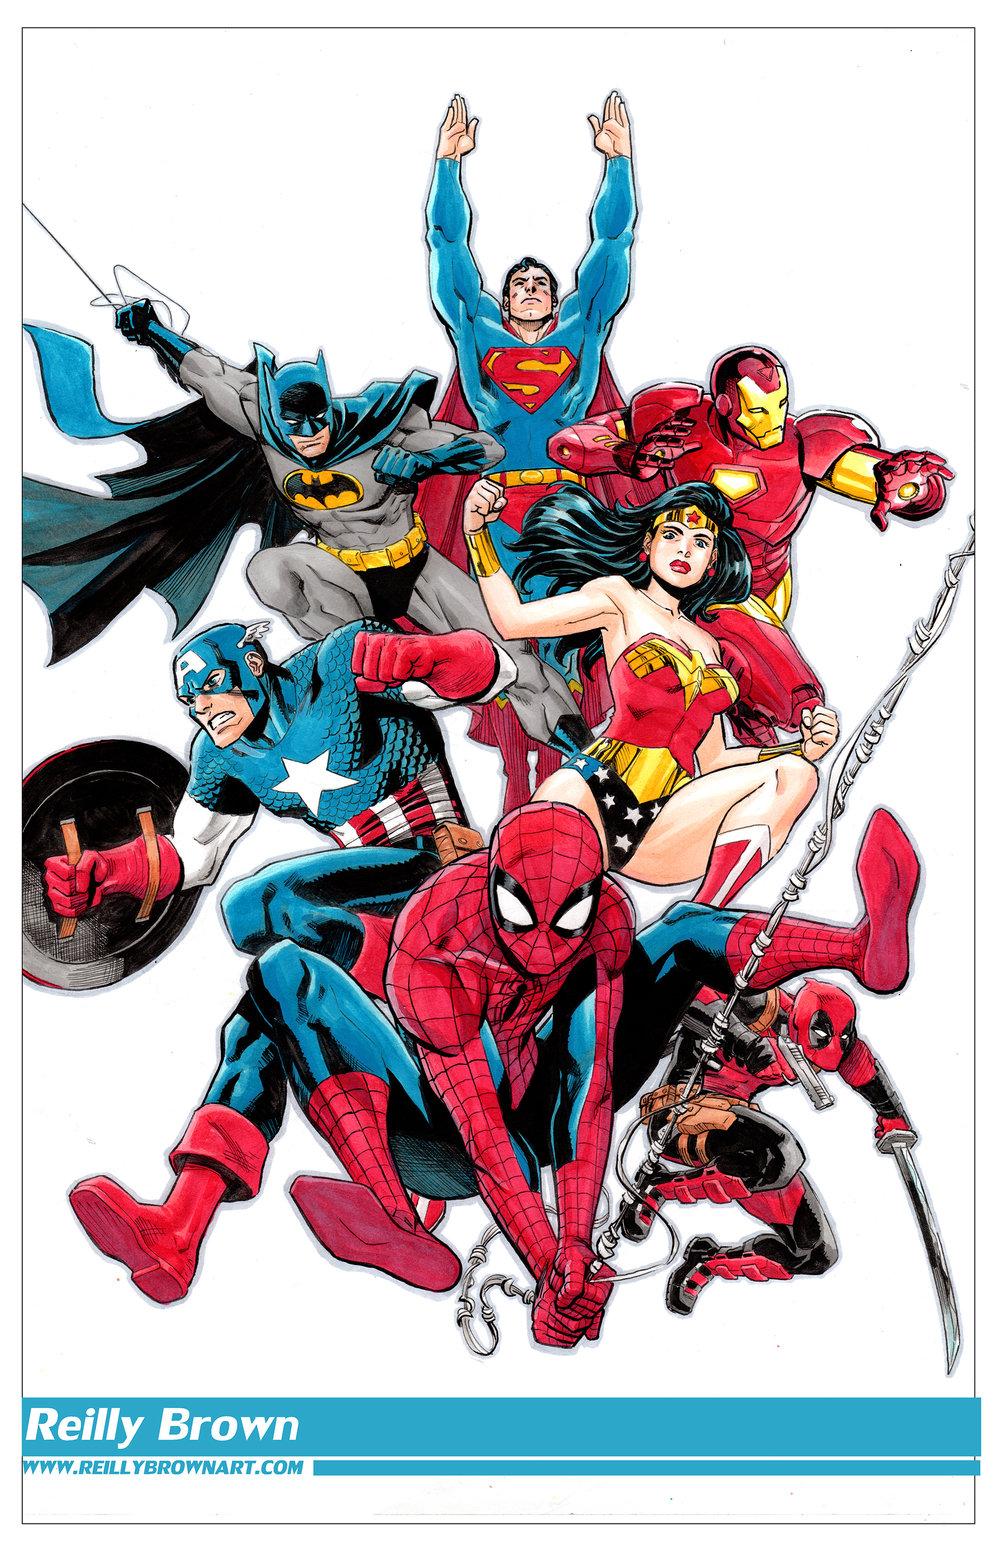 Reilly Marvel & DC